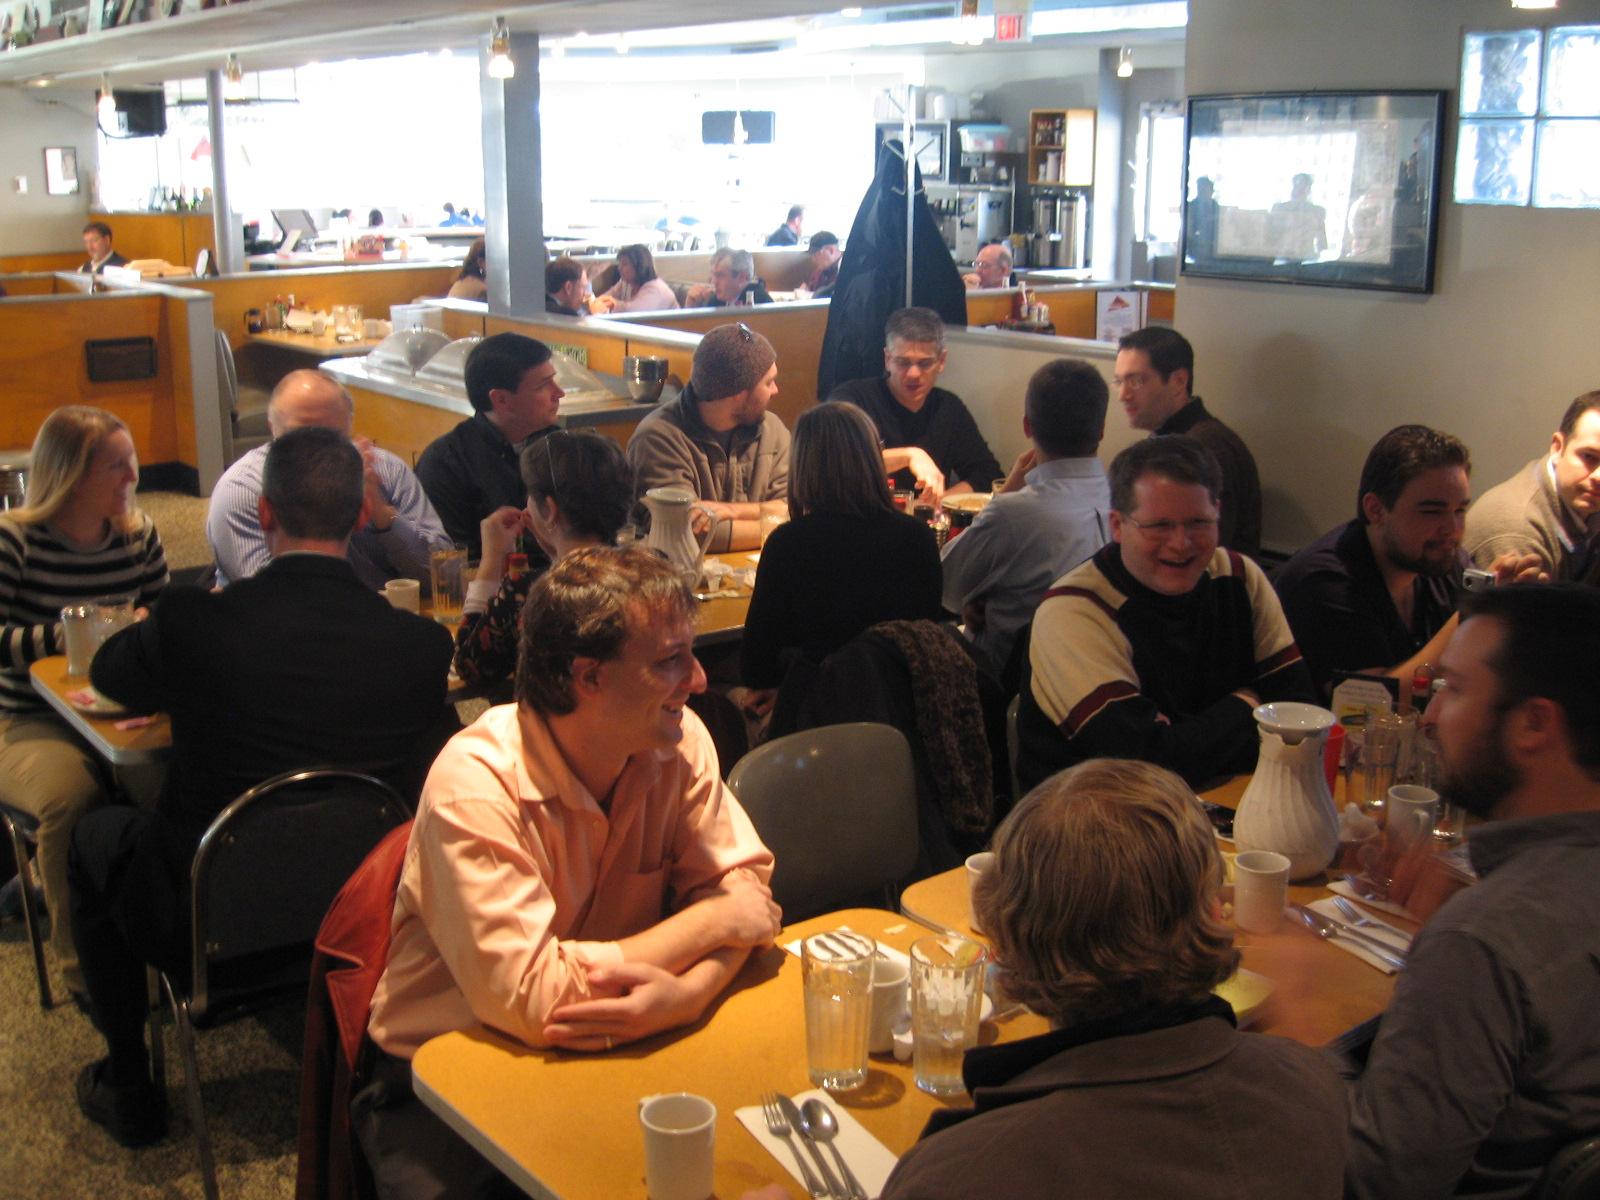 nashville-geek-breakfast---november_3046031331_o.jpg